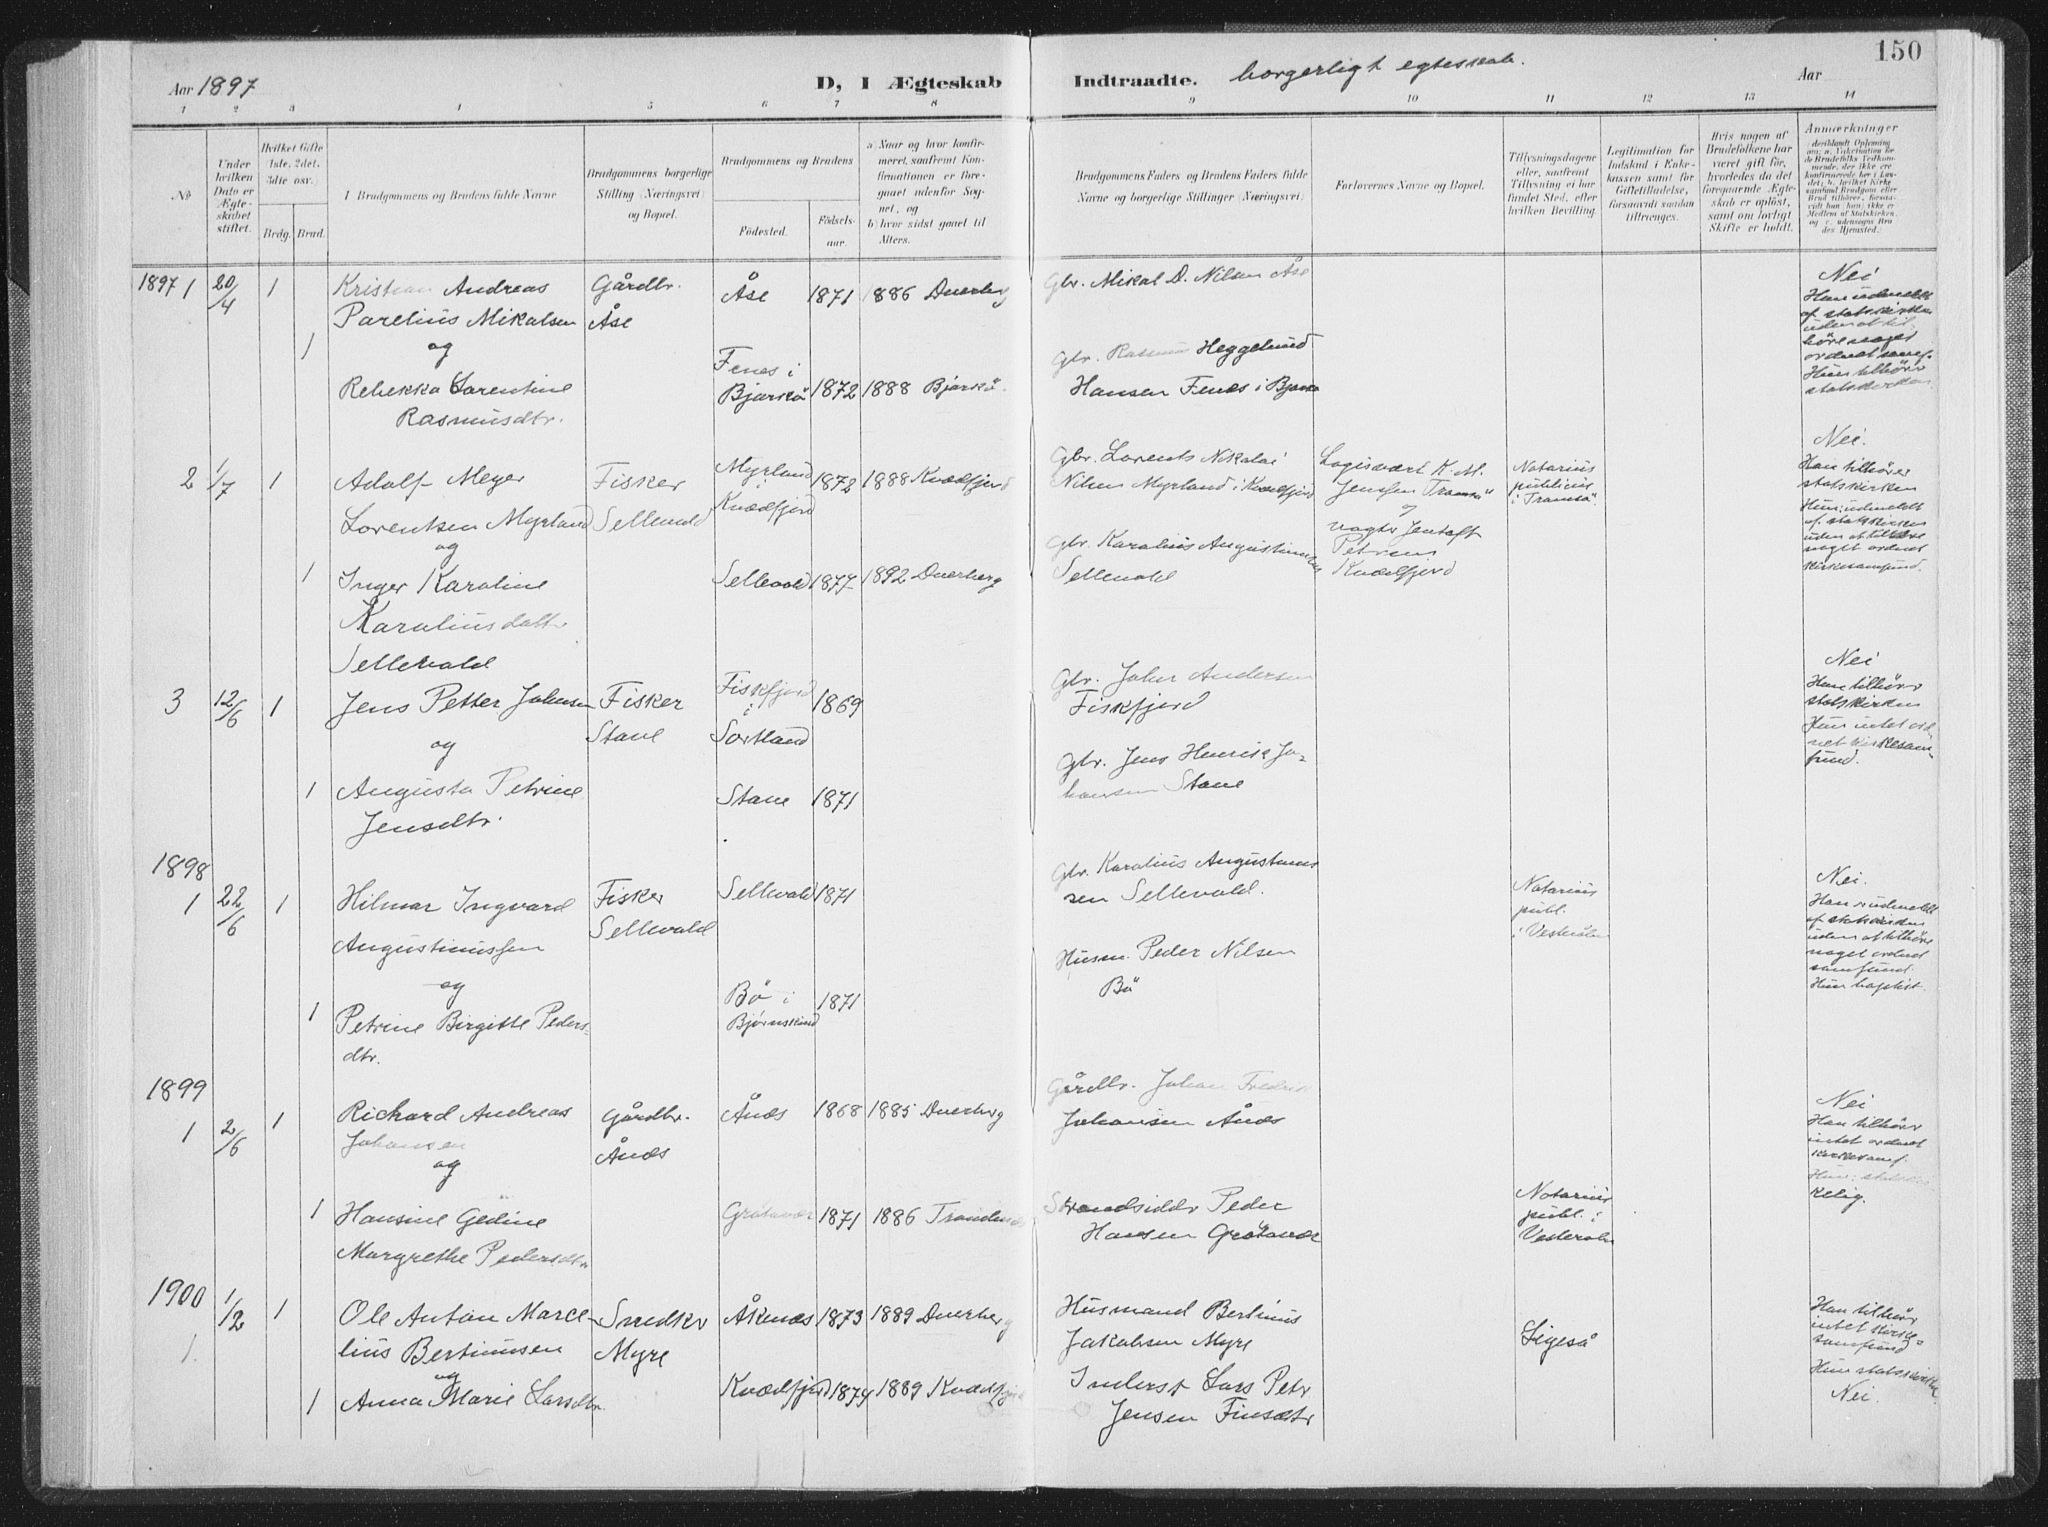 SAT, Ministerialprotokoller, klokkerbøker og fødselsregistre - Nordland, 897/L1400: Ministerialbok nr. 897A07, 1897-1908, s. 150